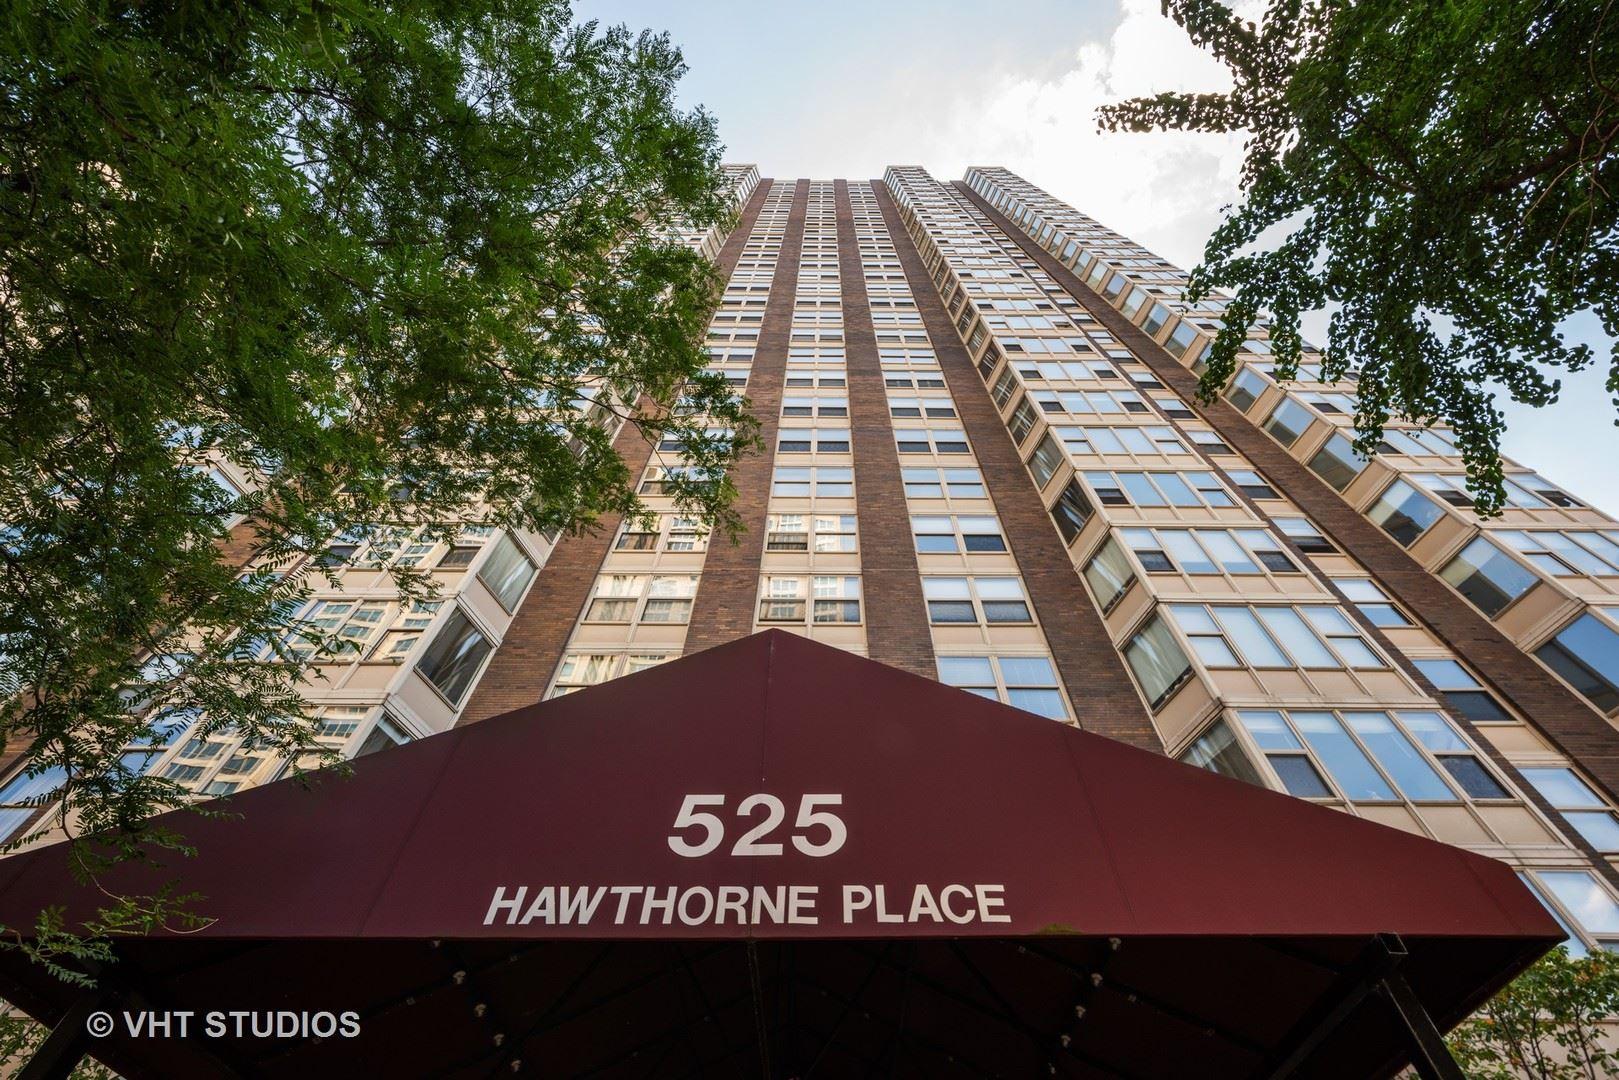 525 W HAWTHORNE Place #2004, Chicago, IL 60657 - #: 10772369